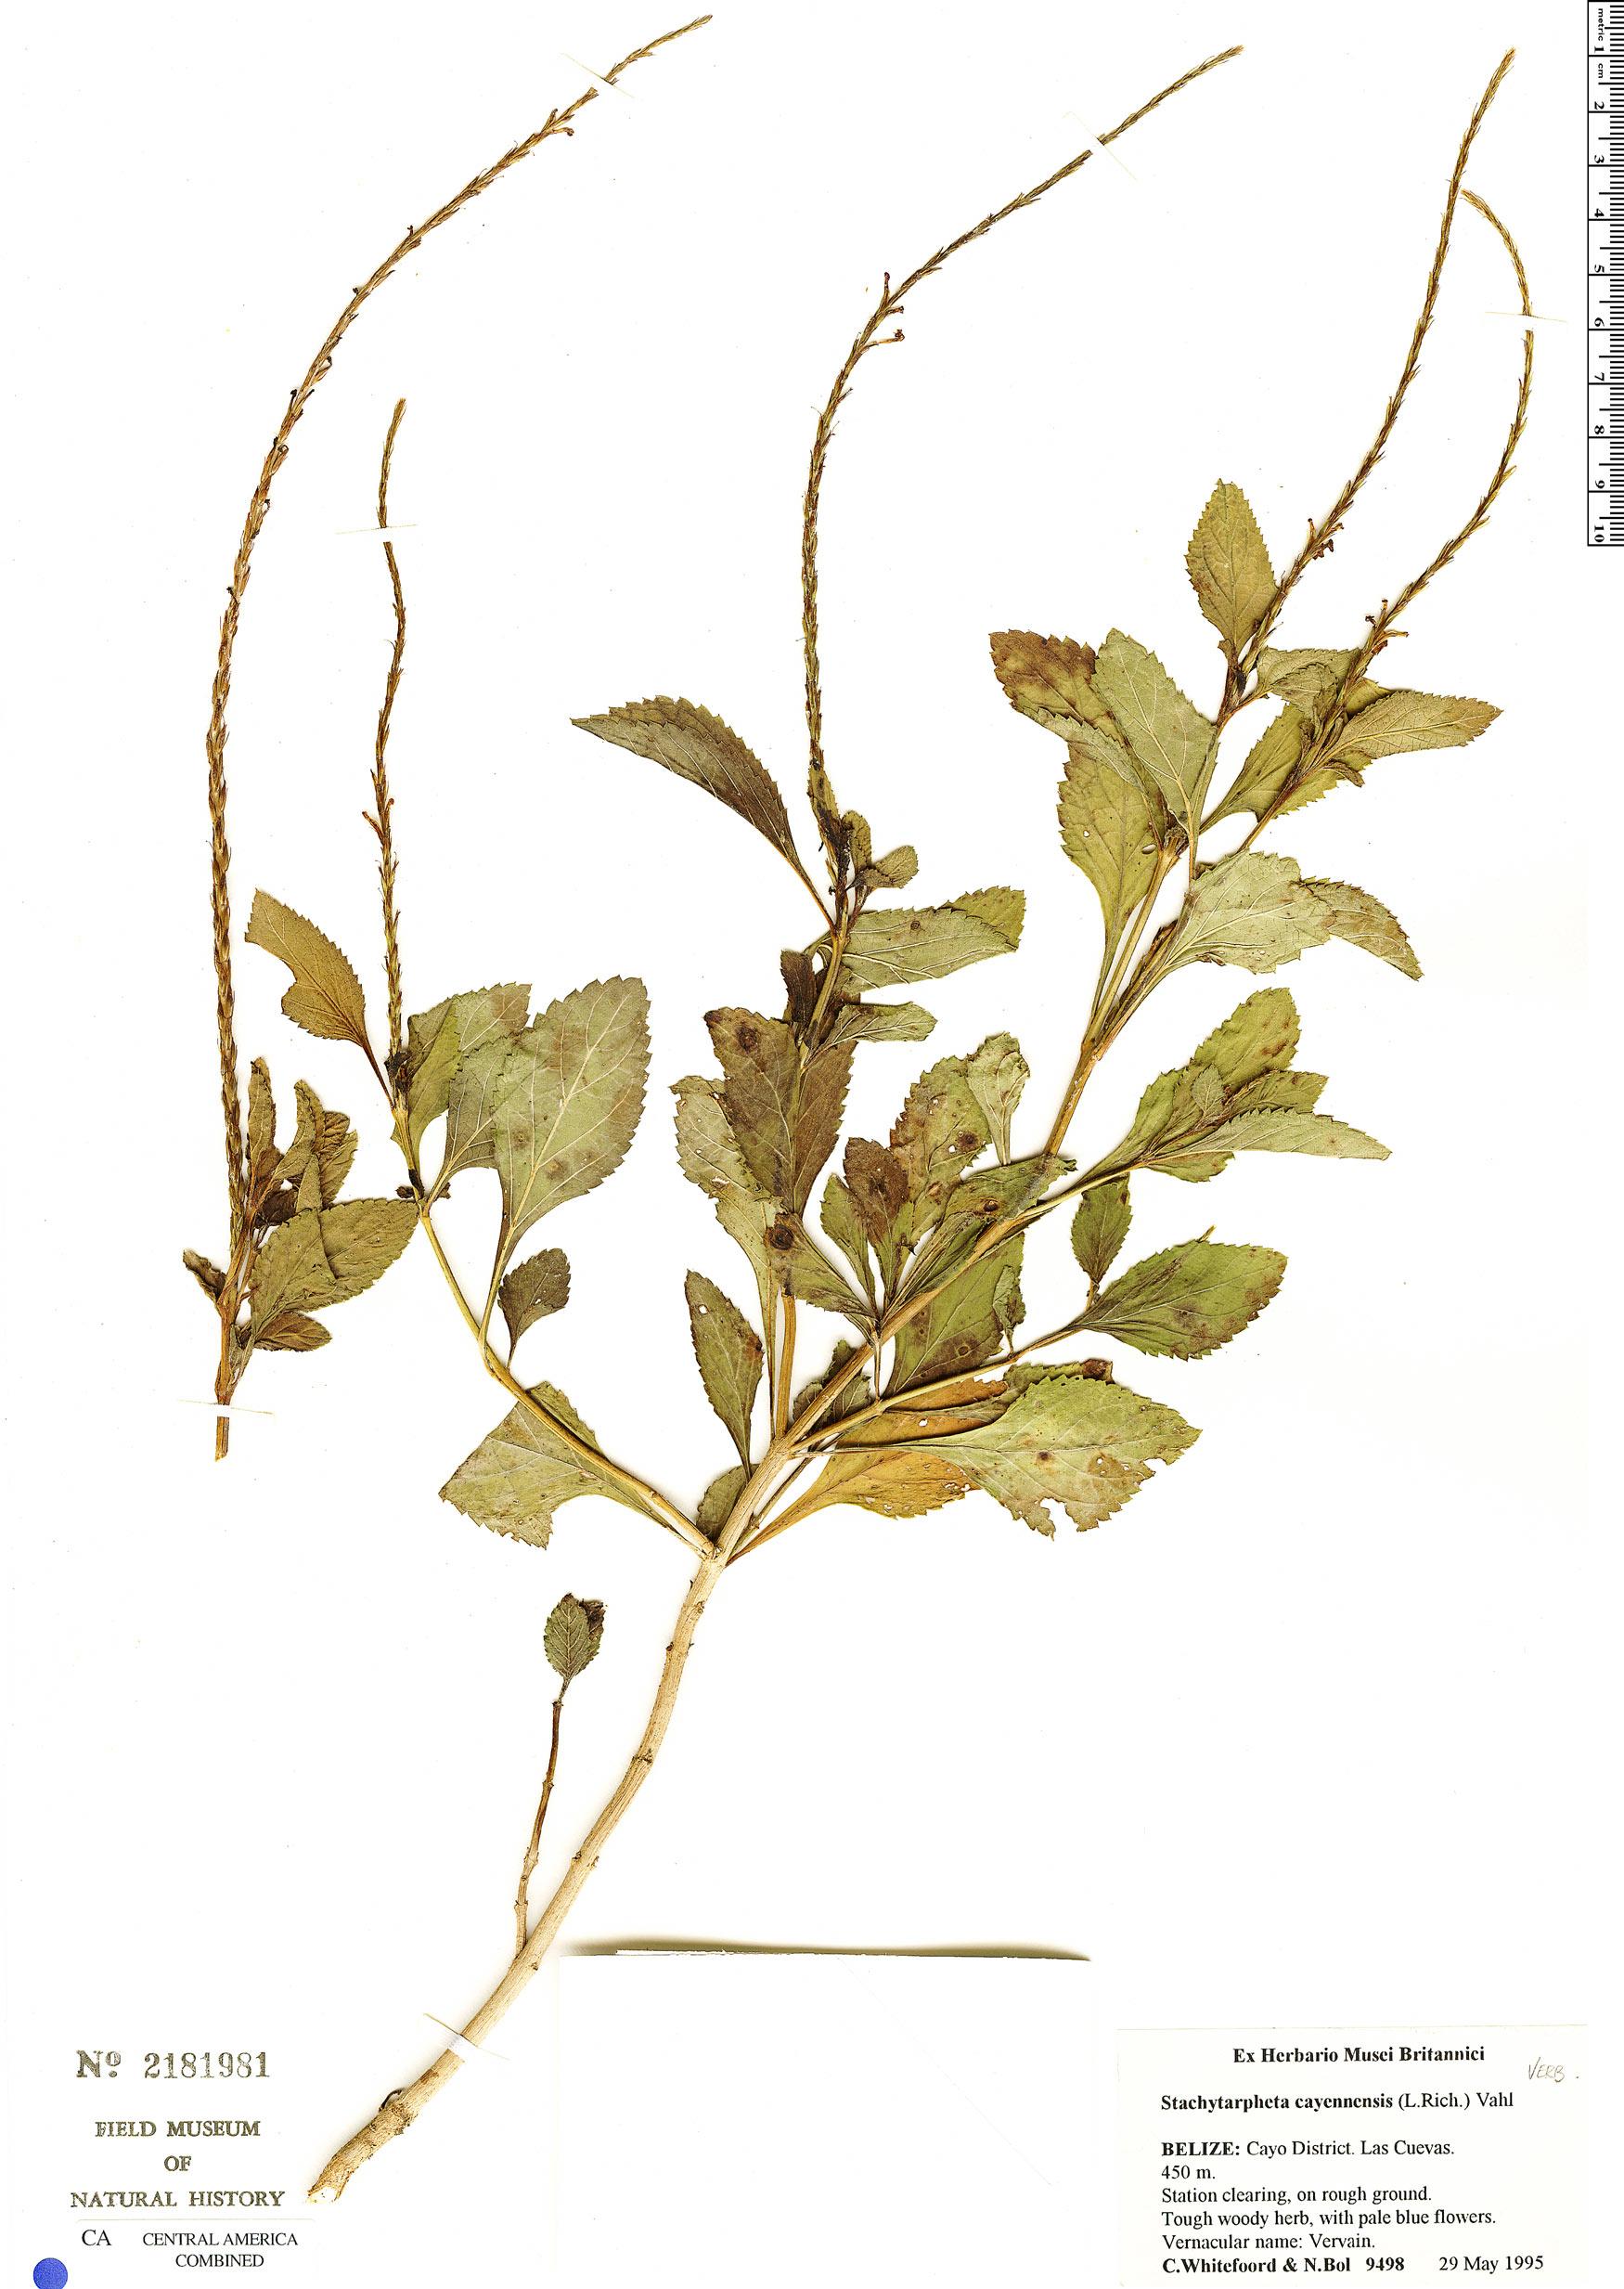 Stachytarpheta cayennensis image